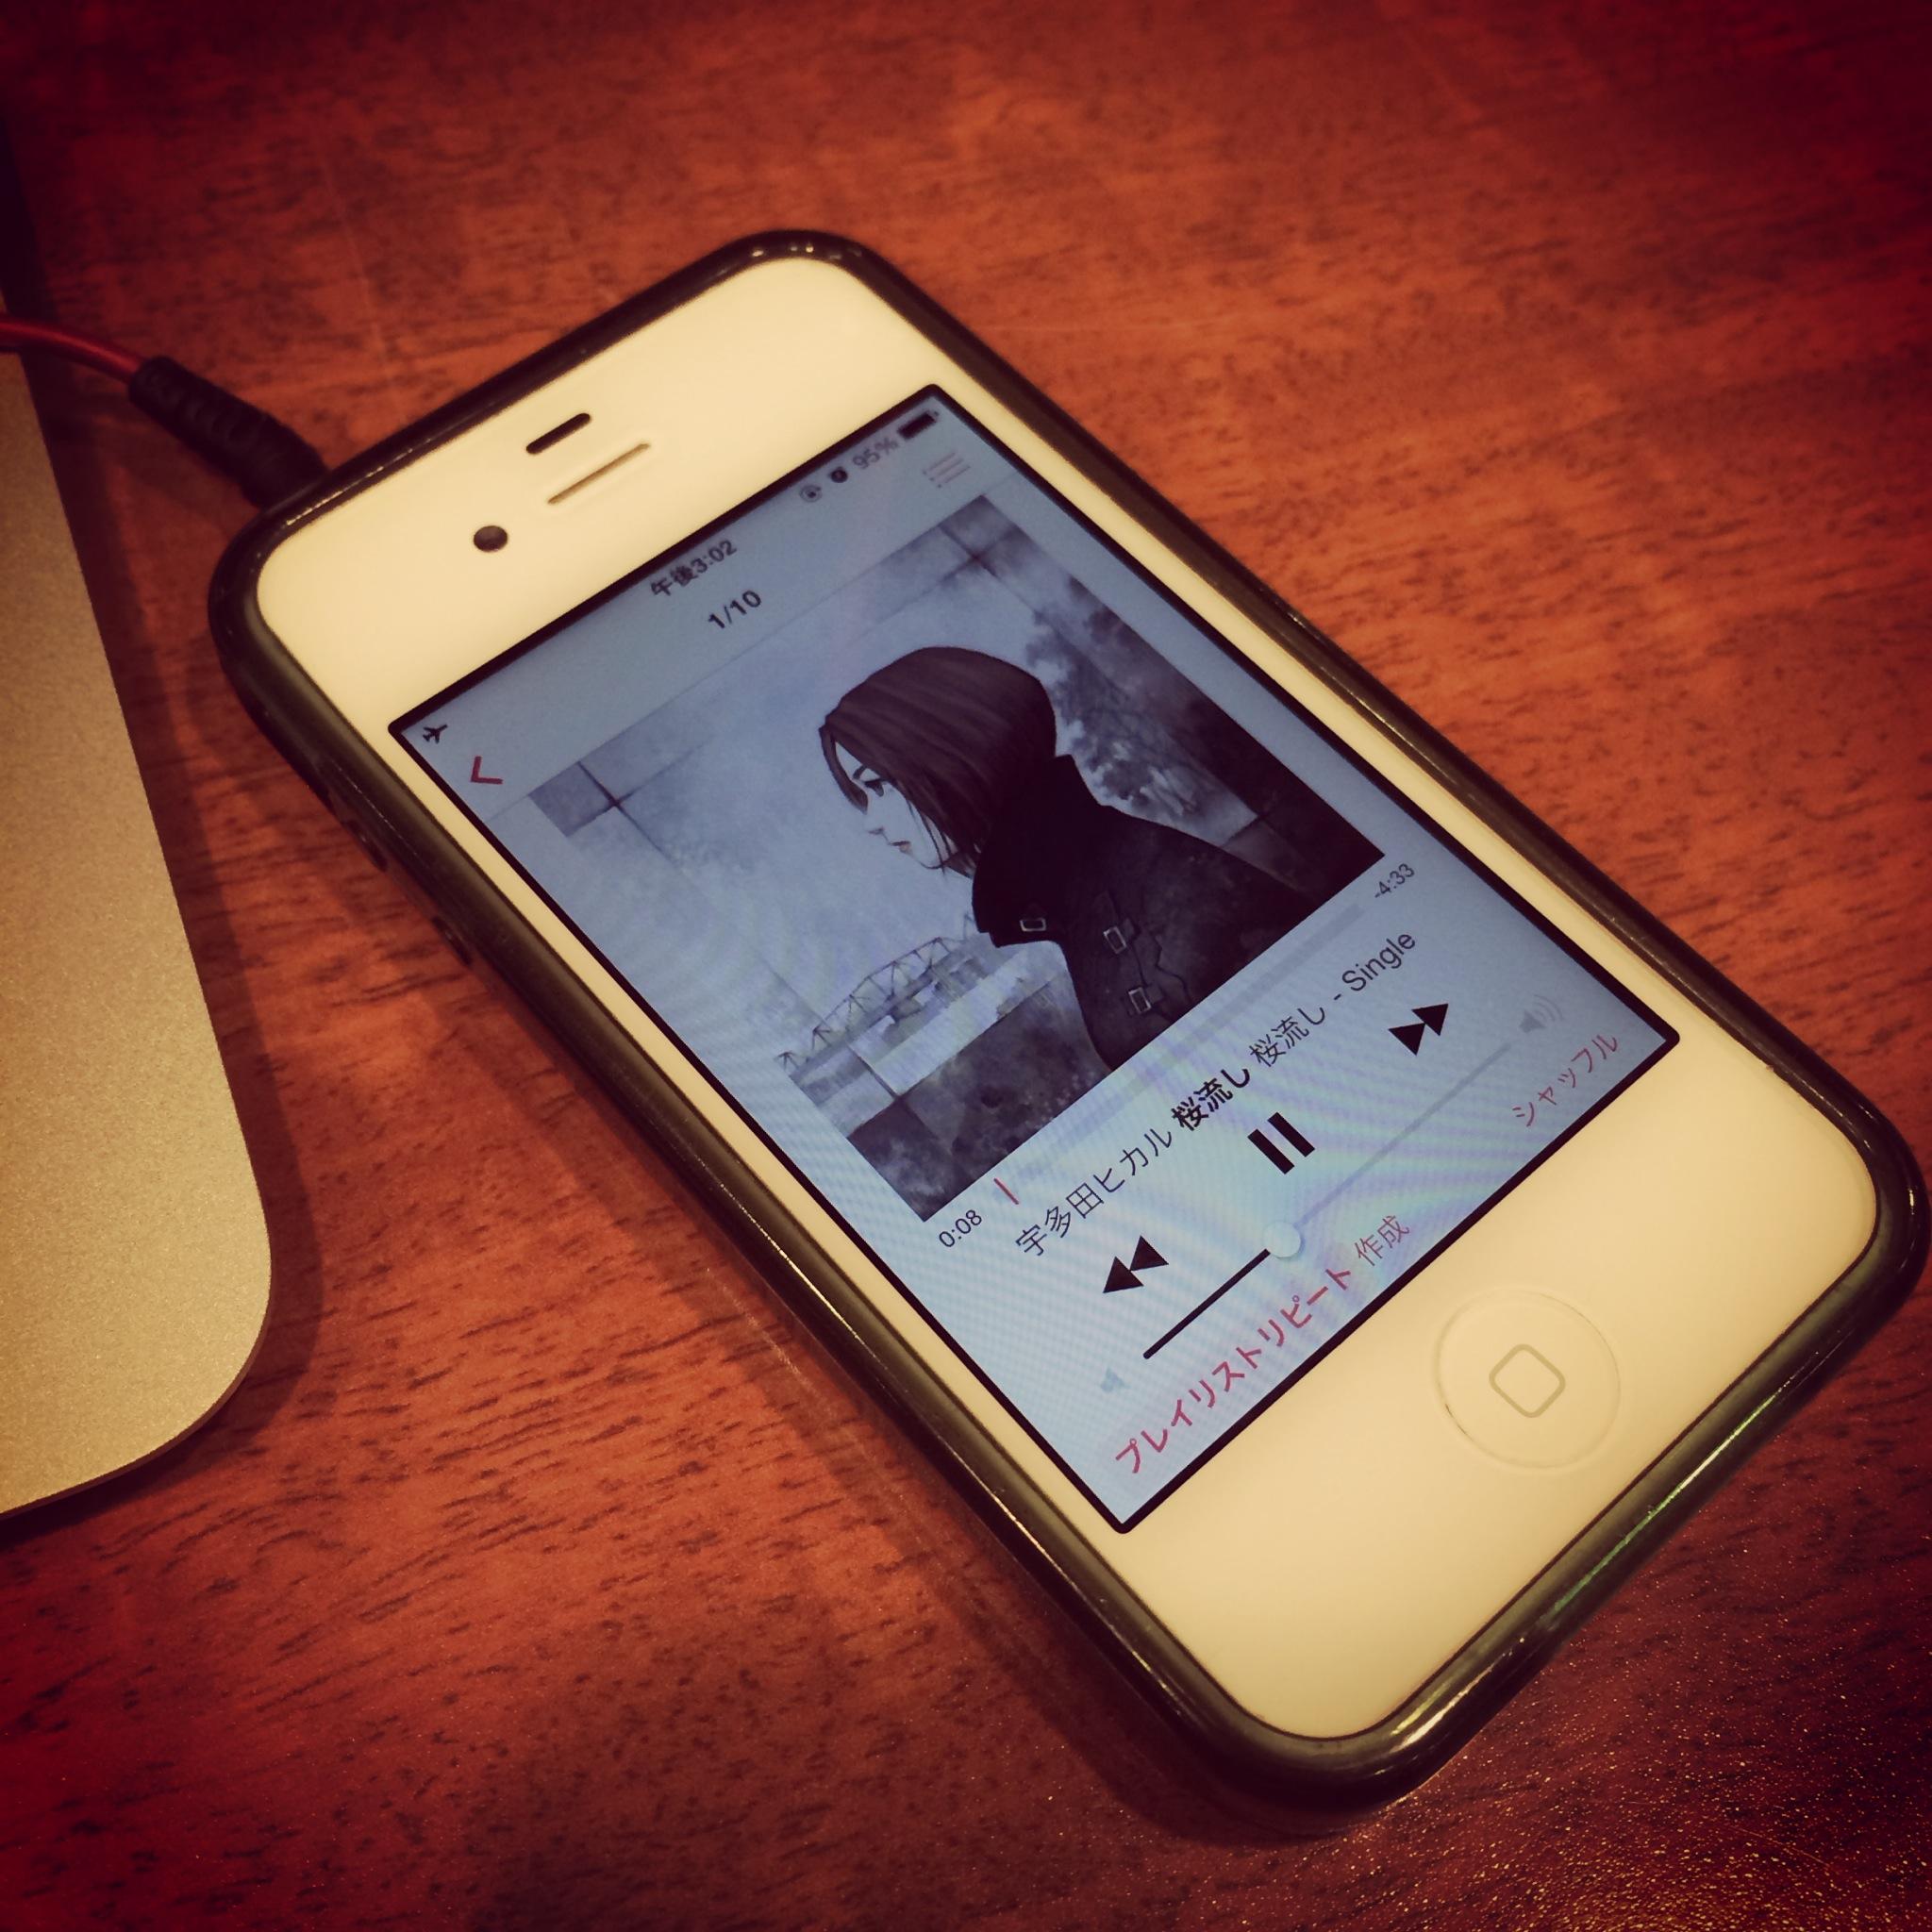 iphone 4s-ipod